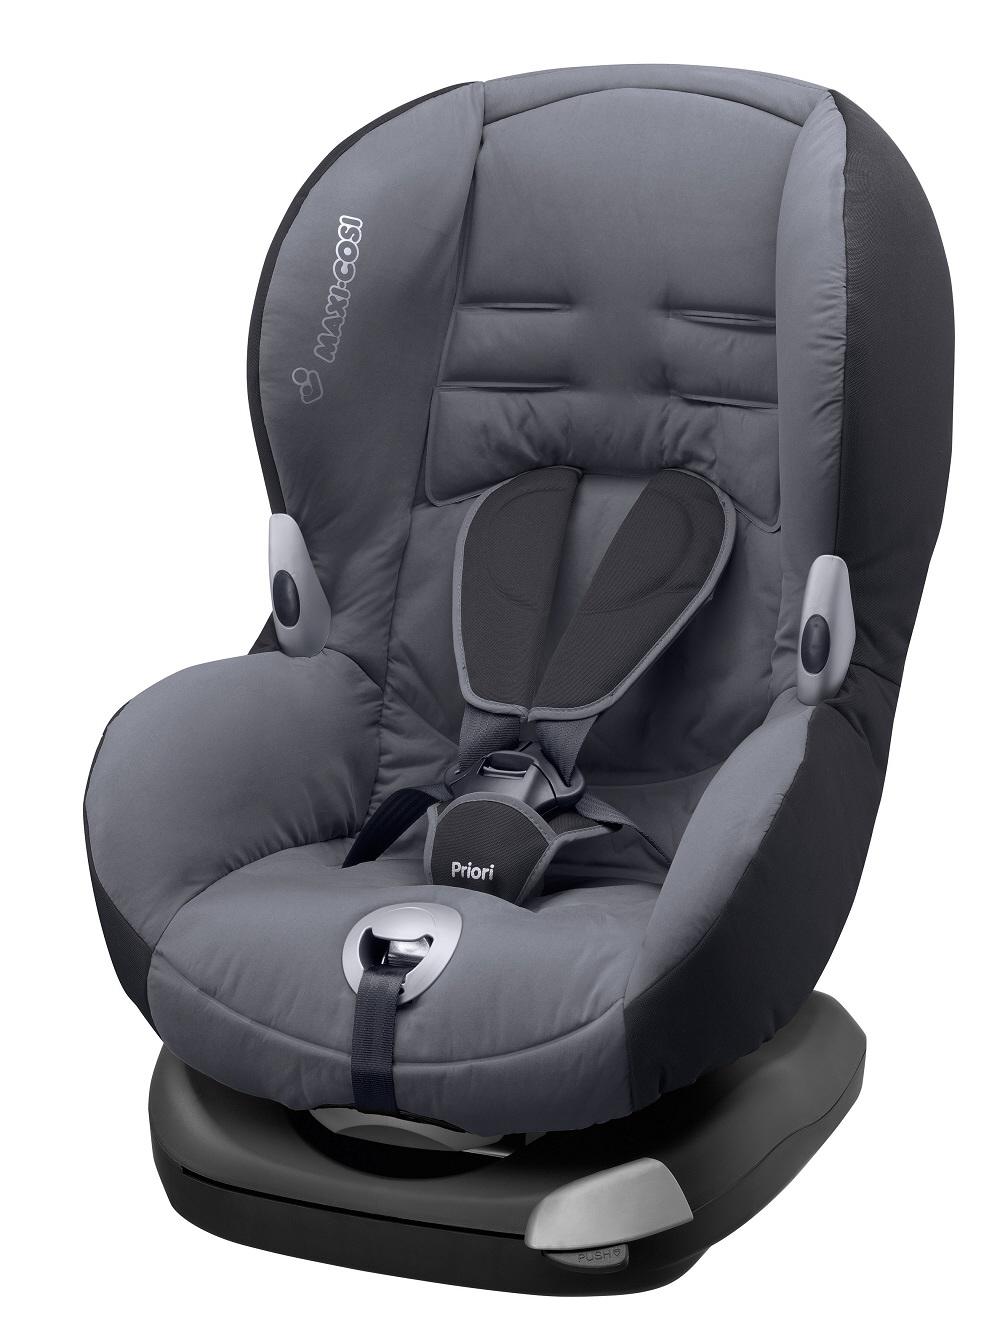 maxi cosi child car seat priori xp 2015 solid grey buy at kidsroom car seats. Black Bedroom Furniture Sets. Home Design Ideas